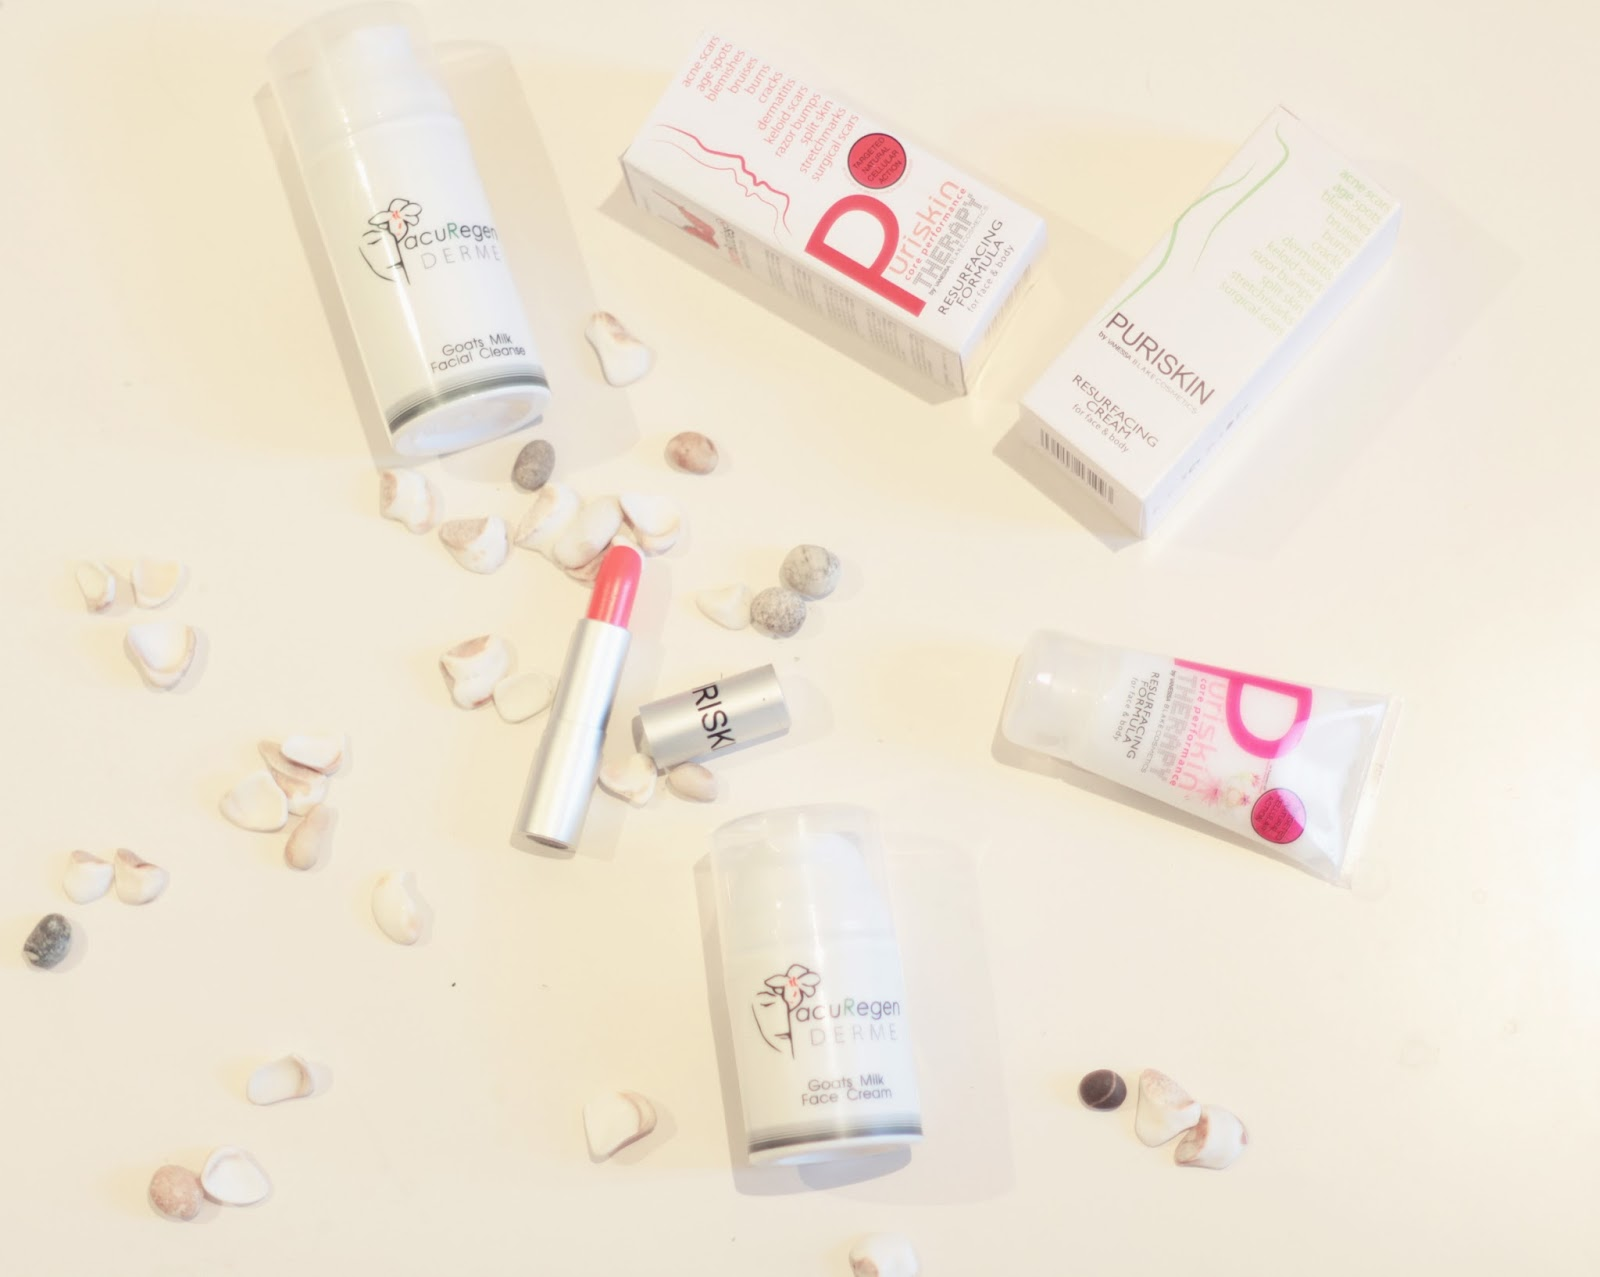 ACUREGEN cosmetics puriskin resurfacing formula white blog flatlay